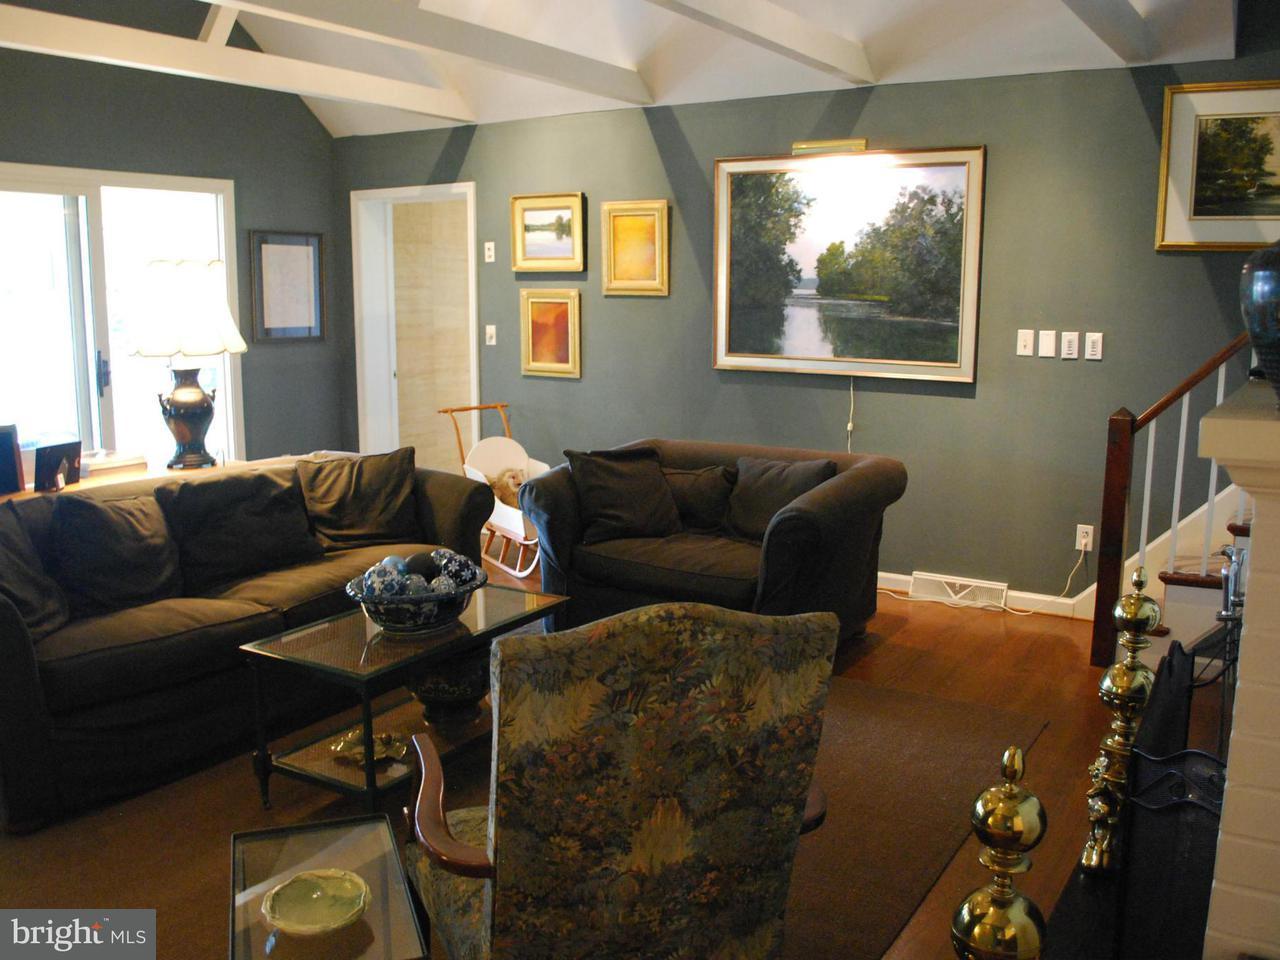 Additional photo for property listing at 100 SULLIVANS ALY 100 SULLIVANS ALY Oxford, Мэриленд 21654 Соединенные Штаты